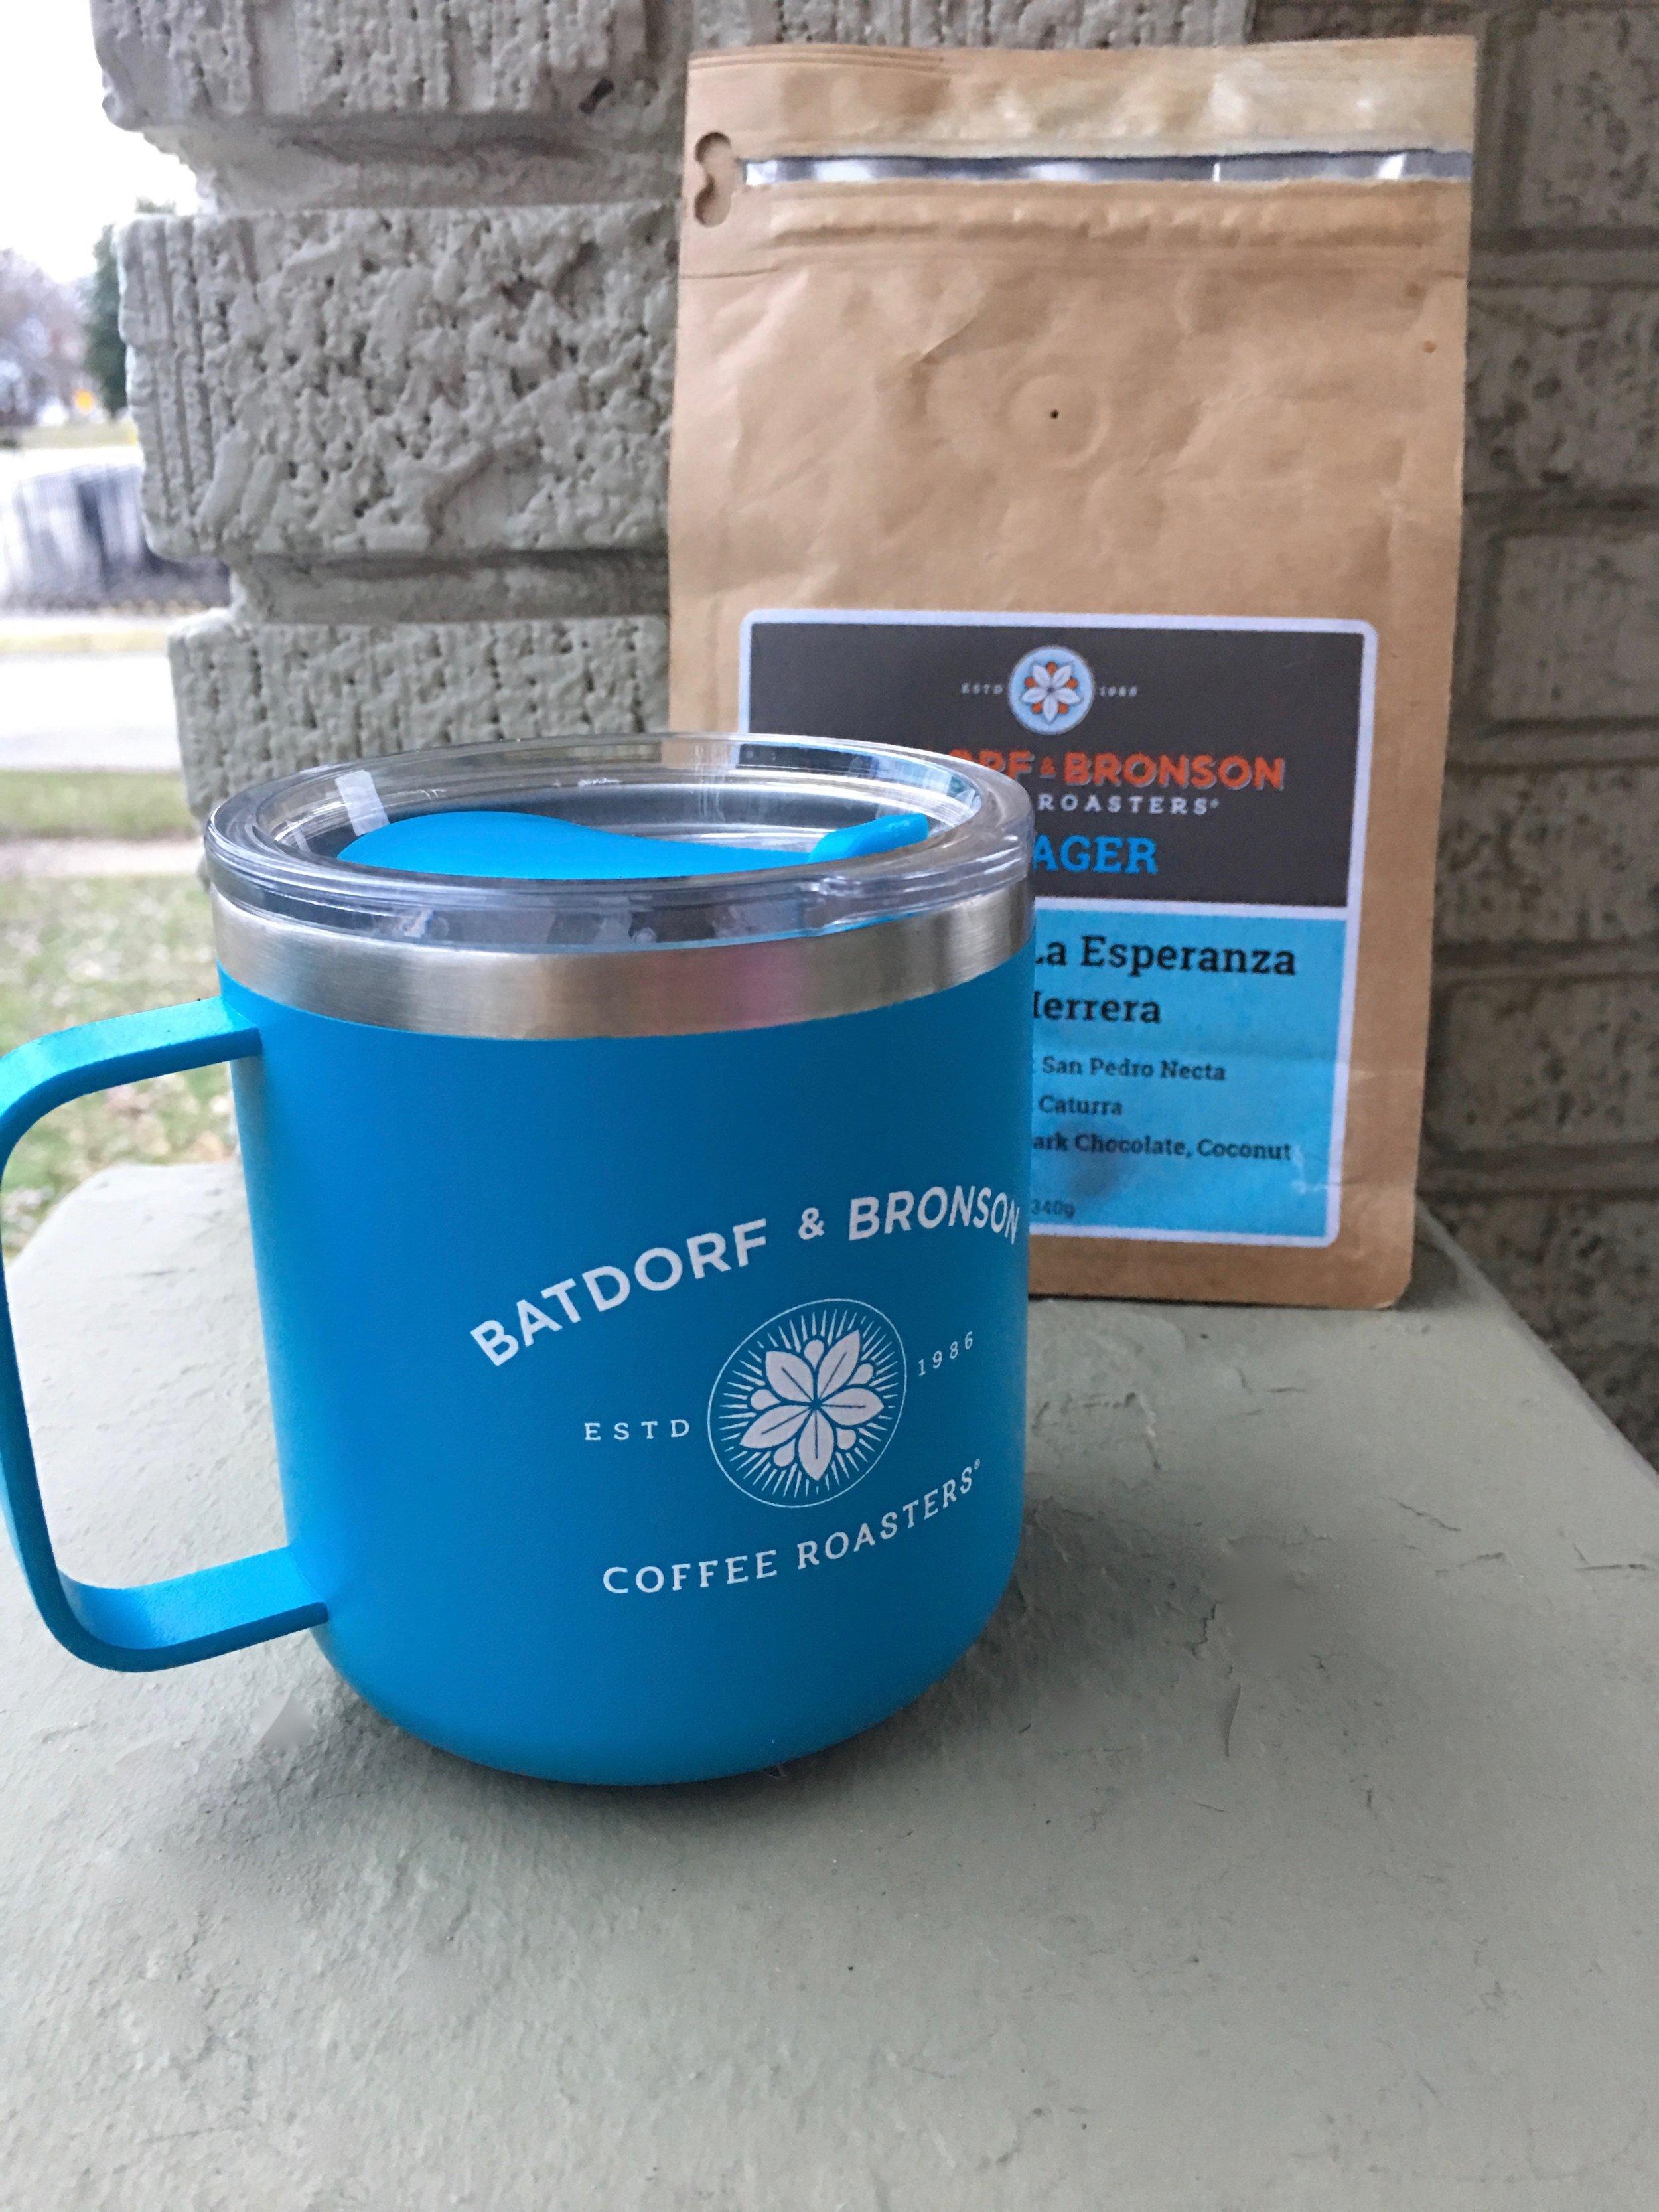 Batdorf & Bronson Guatemala La Esperanza coffee